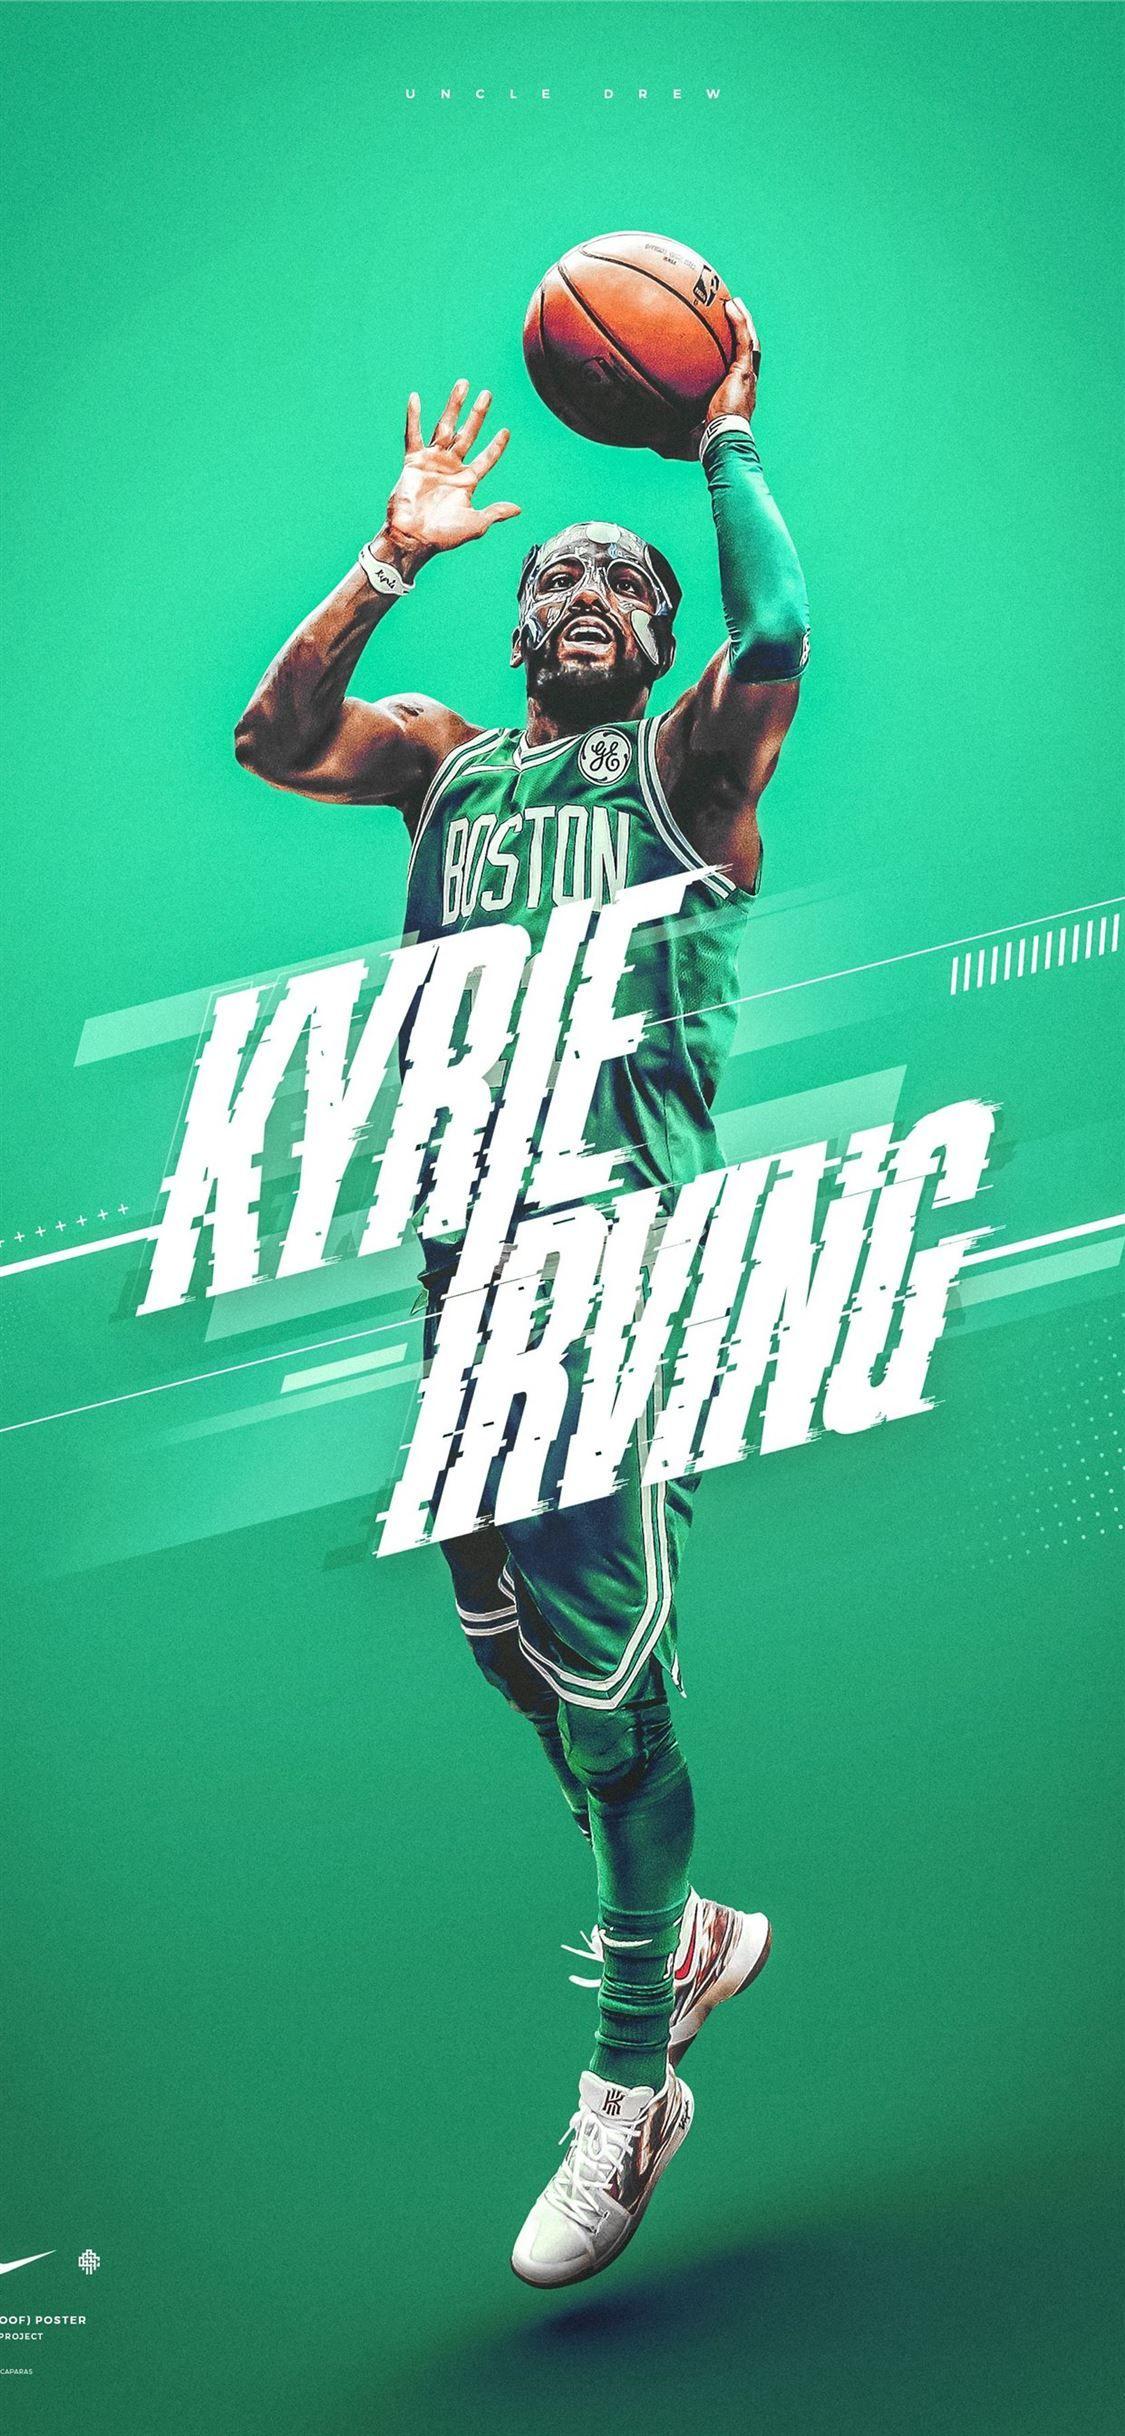 Nike Kyrieirving Sportcelebrity Basketballcelebrity Unitedstates Iphone11wallpaper In 2020 Irving Wallpapers Kyrie Irving Nike Wallpaper